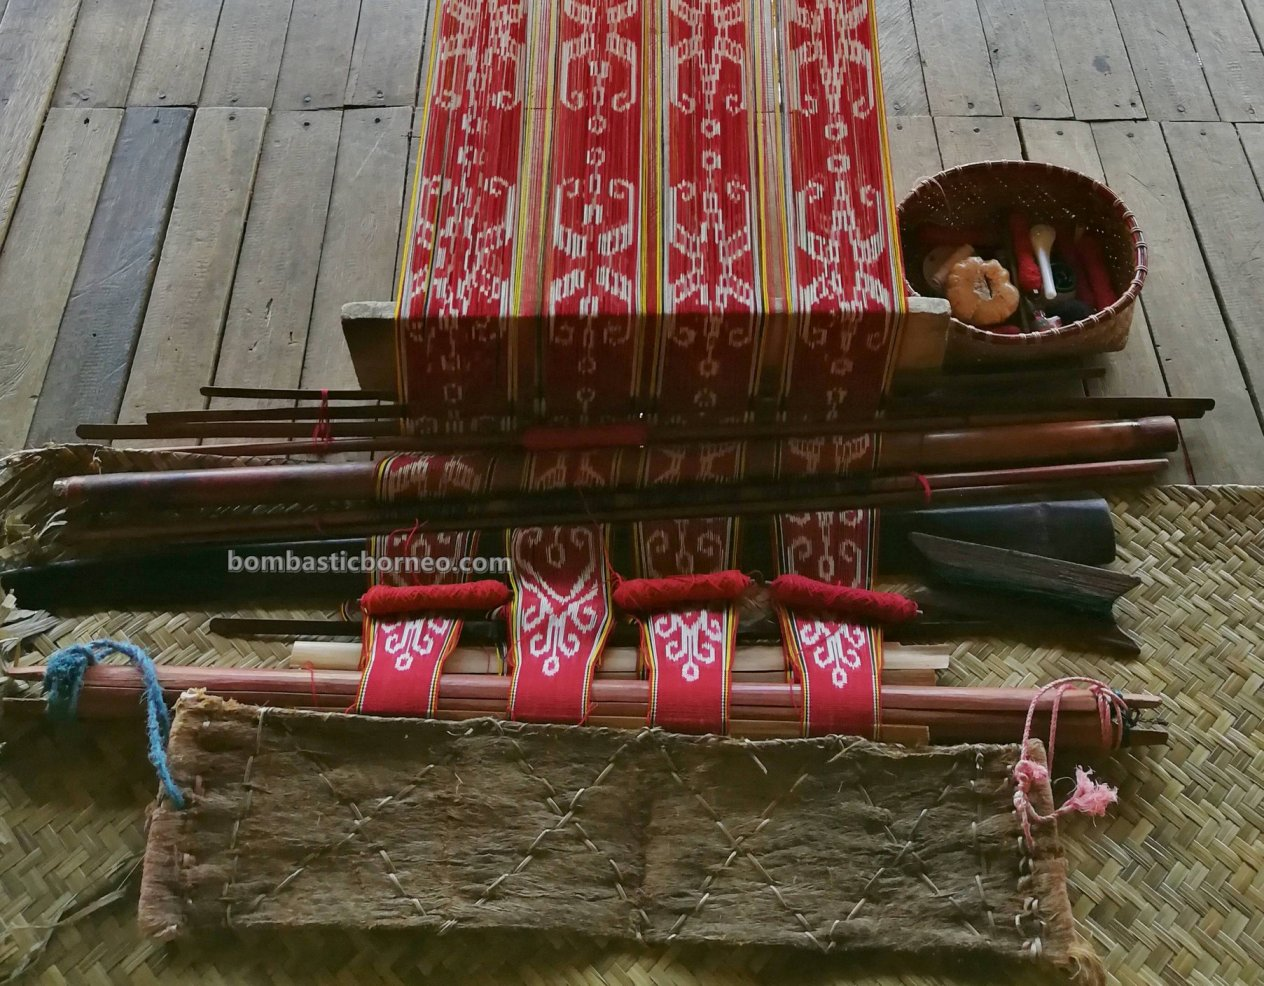 Rumah Betang Ensaid Panjang, tradisional, culture, Sintang, Indonesia, Suku Dayak Desa, tribe, kain tenun, pua kumbu, Obyek wisata, Tourism, Travel guide, cross border, 婆罗洲游踪, 印尼西加里曼丹, 新党旅游景点